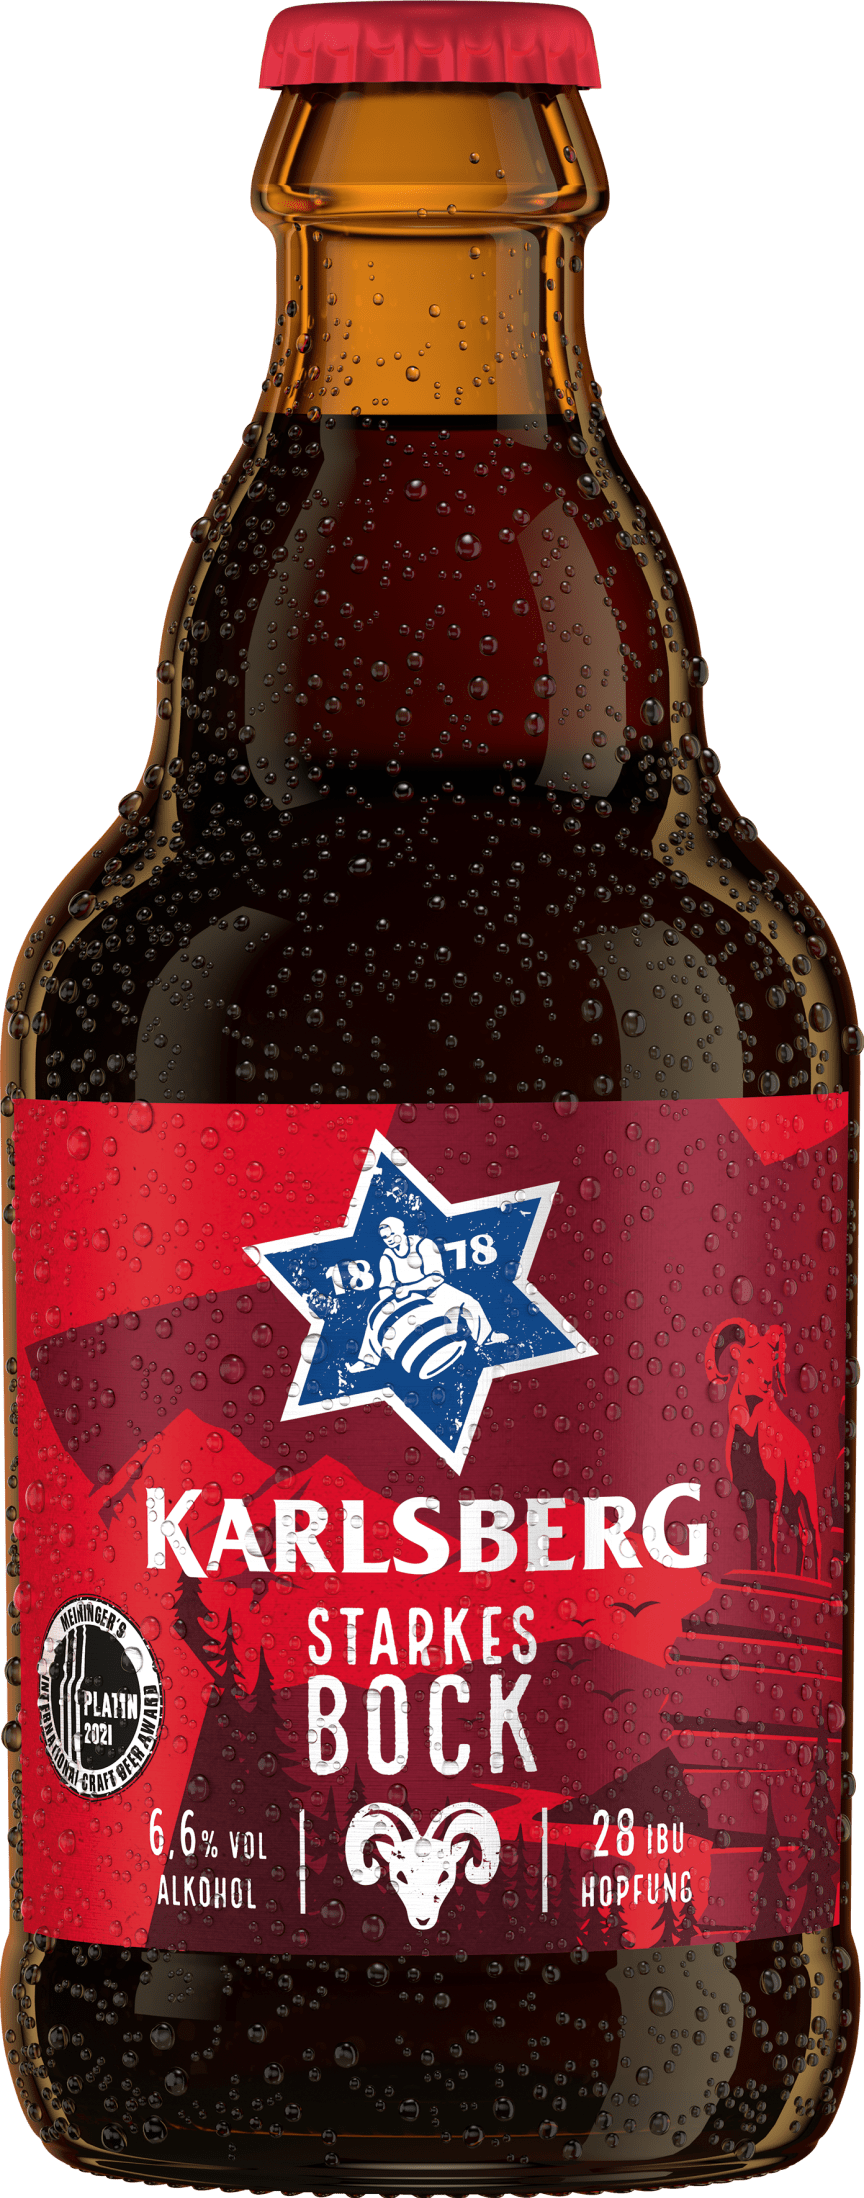 Karlsberg_Bock 2021_Stubbi_Betaut_033l.png